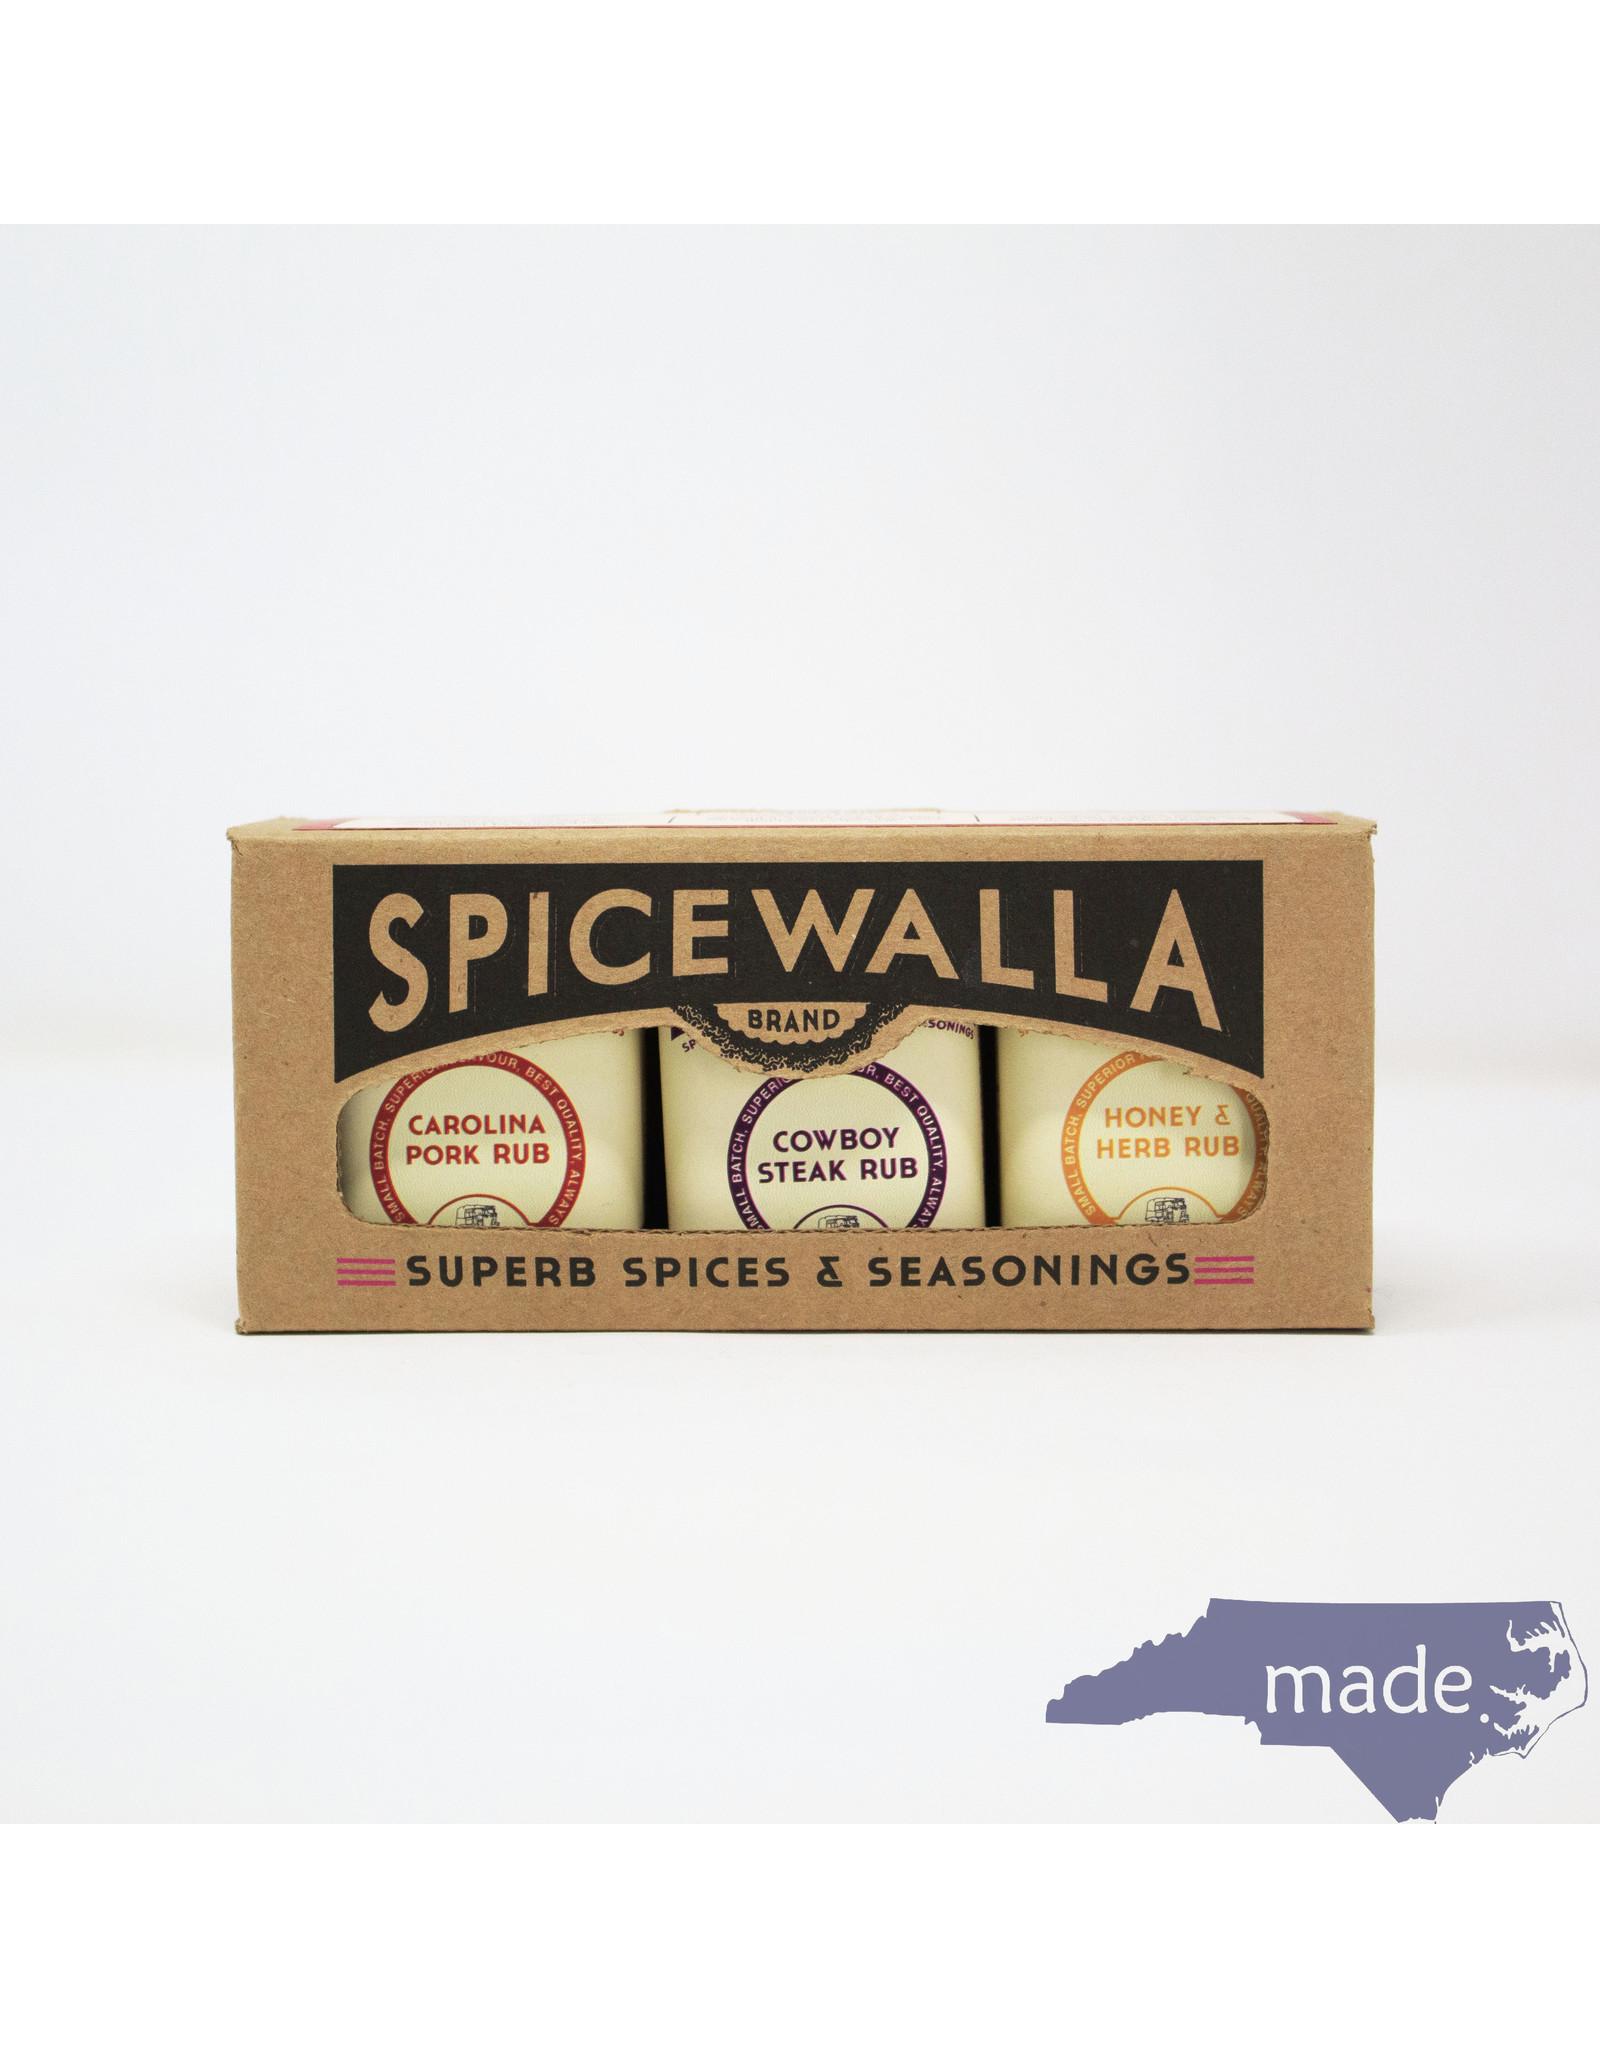 Spicewalla 3 Pack Grill & Roast Collection - Spicewalla